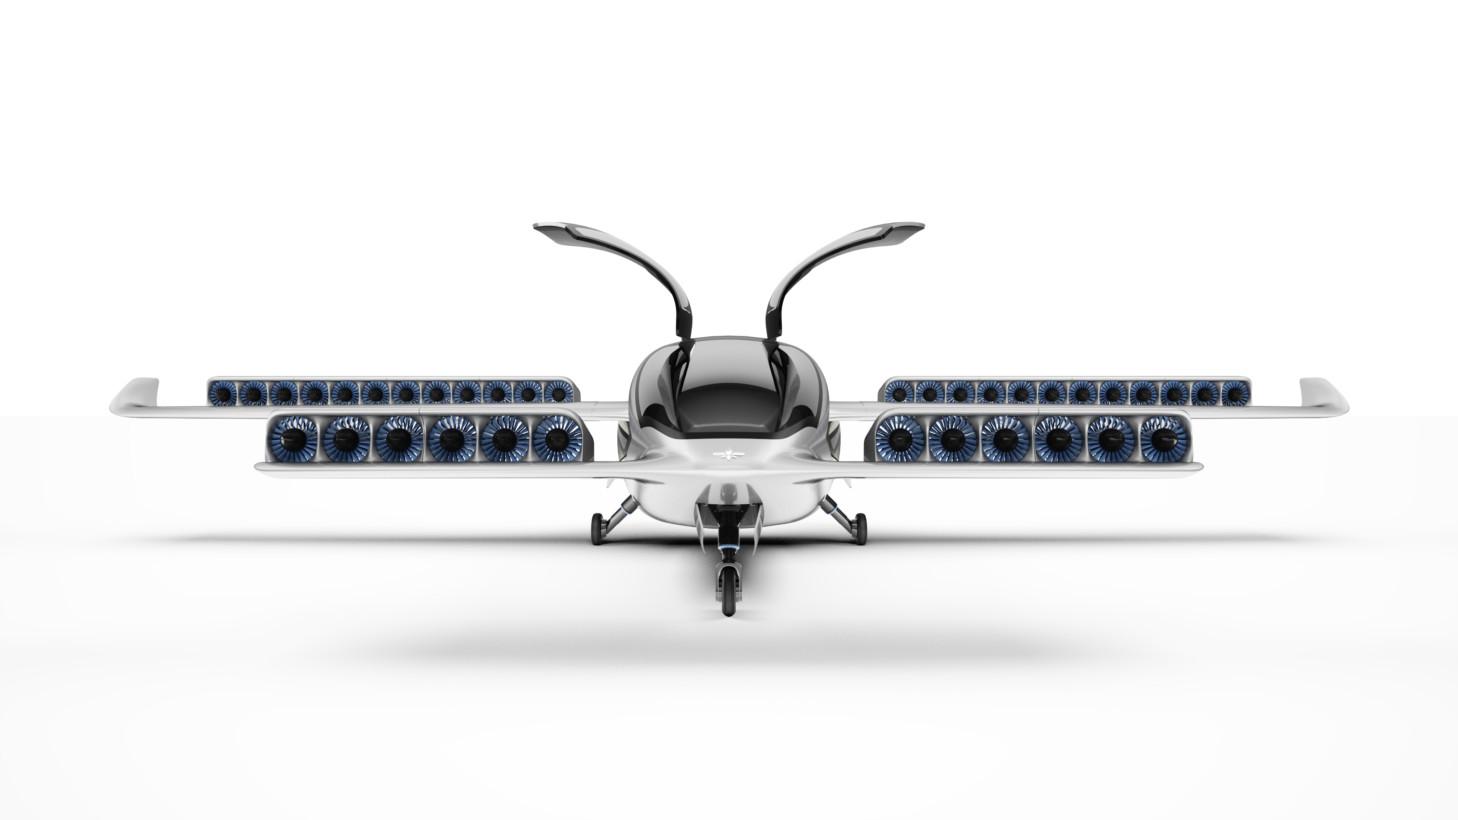 lilium-jet-silver-front-diagonal-doors-open-with-gear